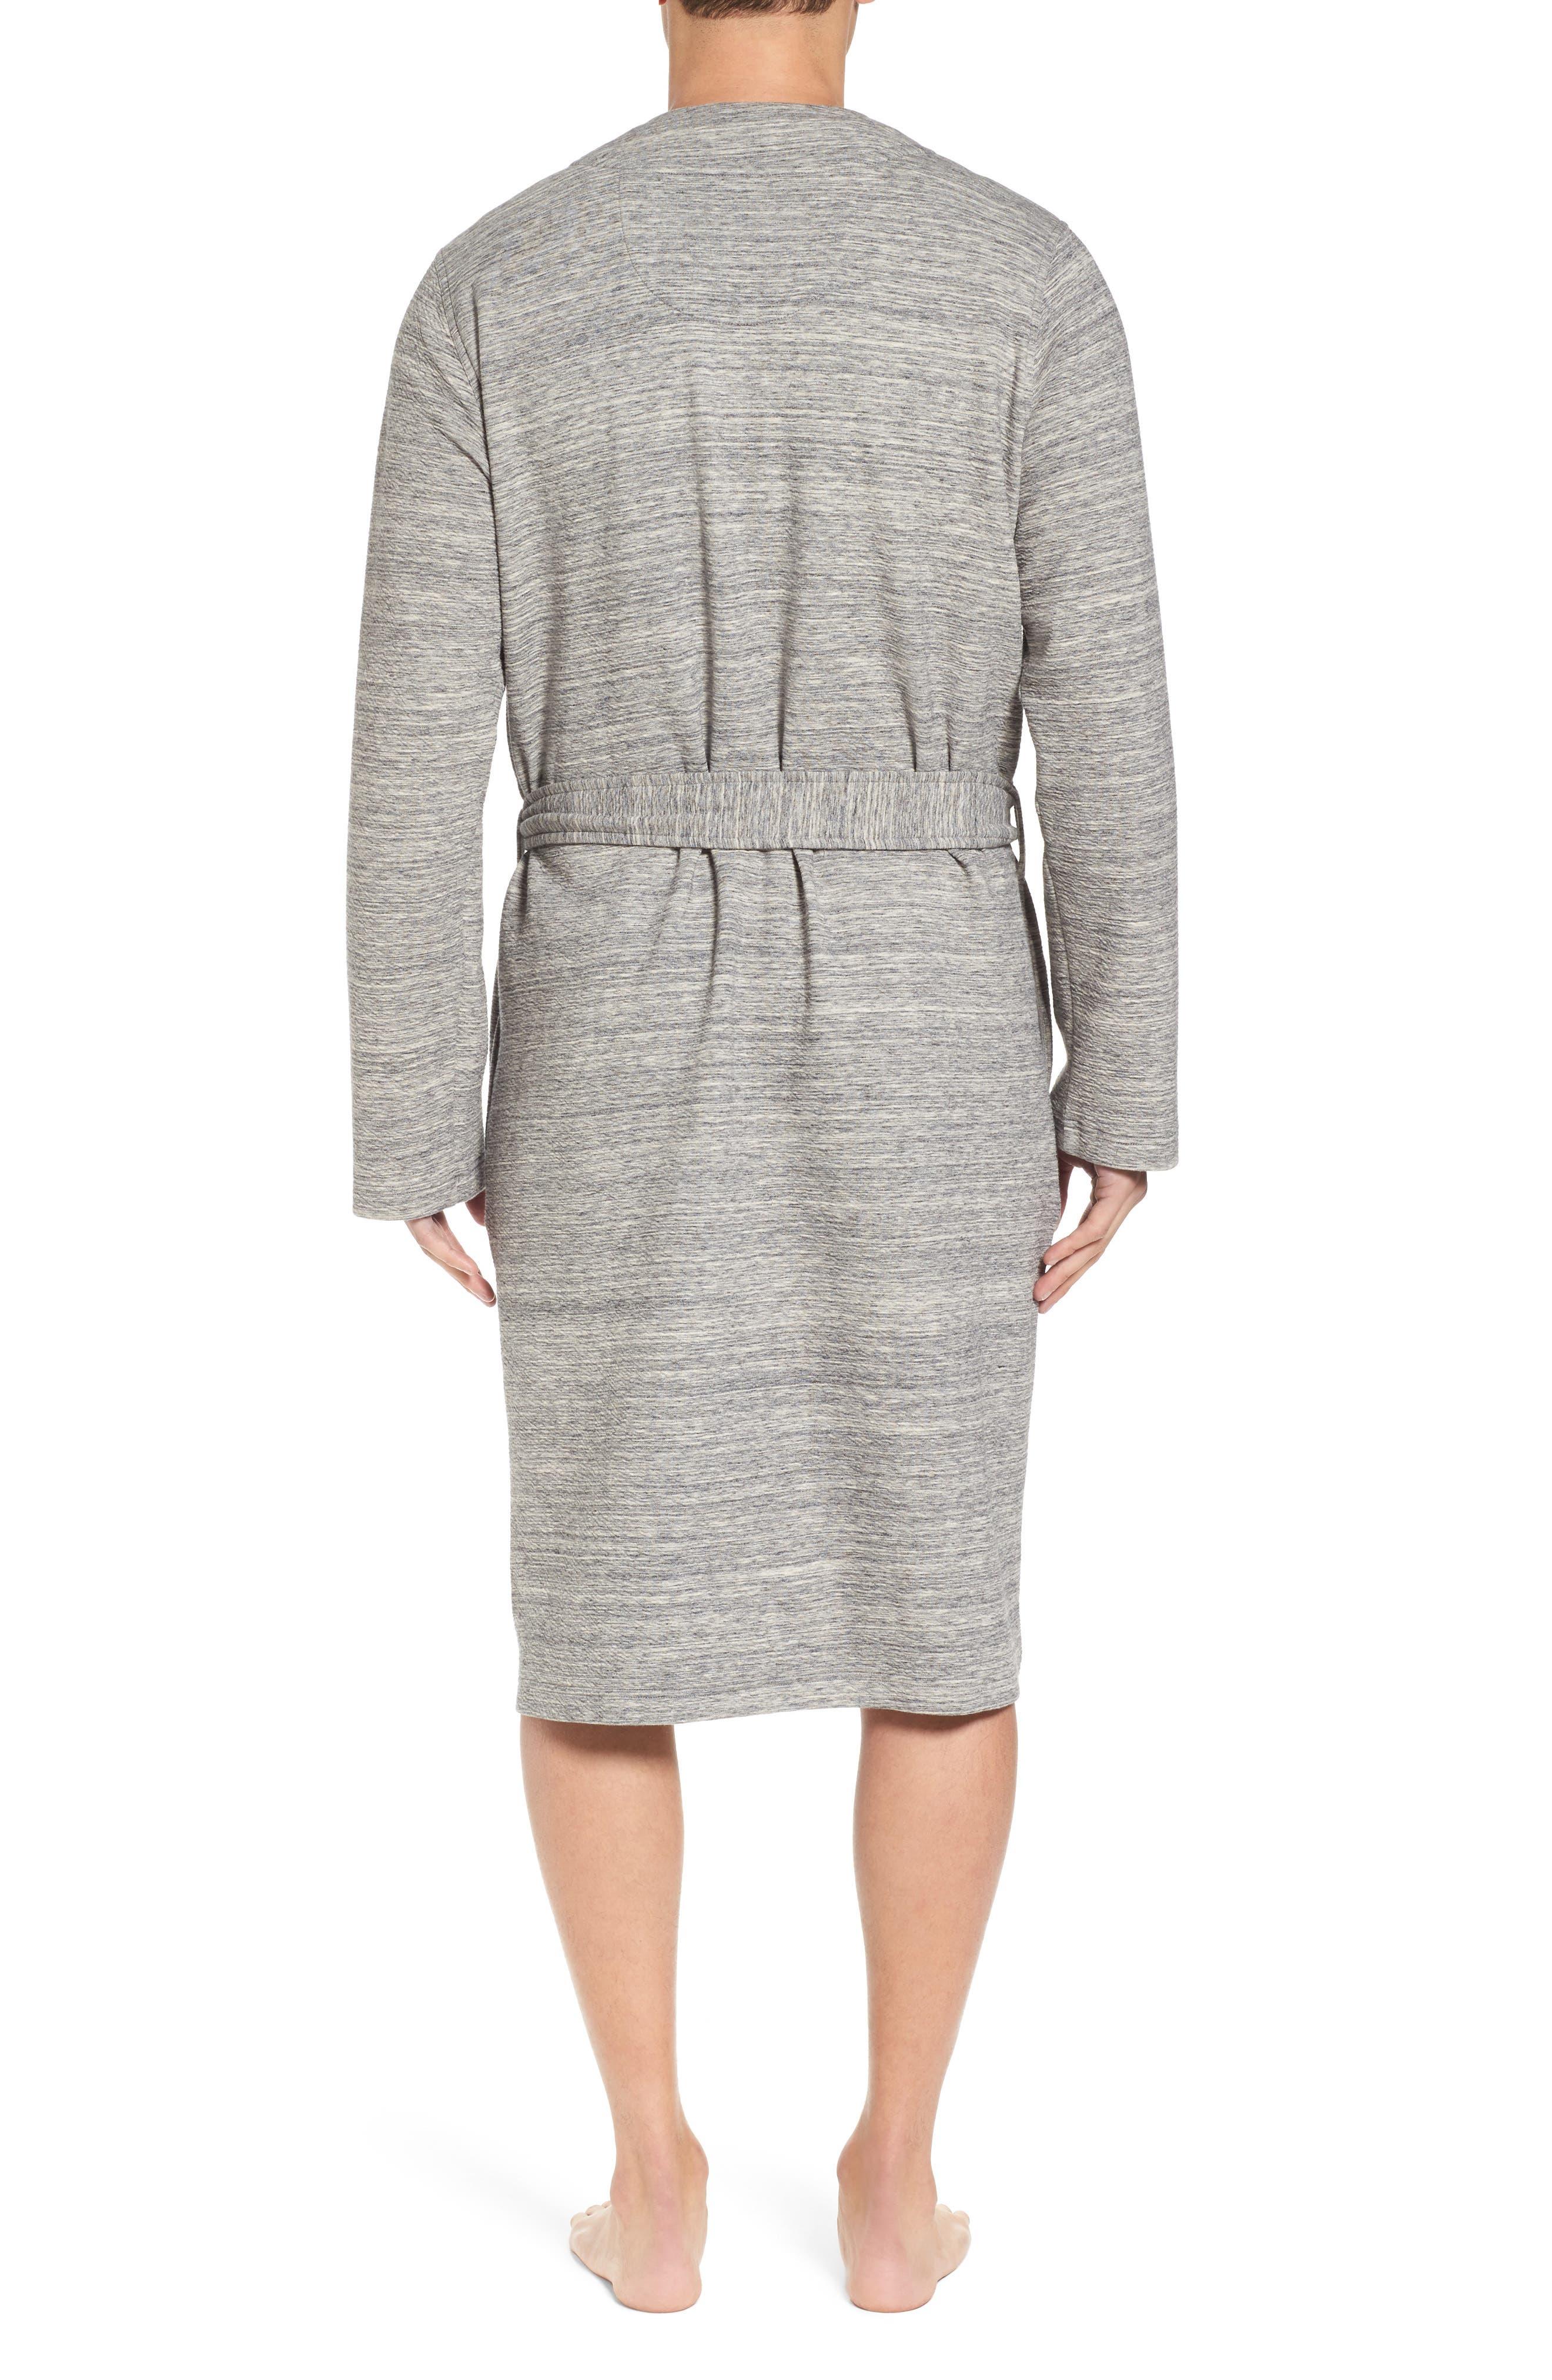 Kent Cotton Blend Robe,                             Alternate thumbnail 2, color,                             Black Heather